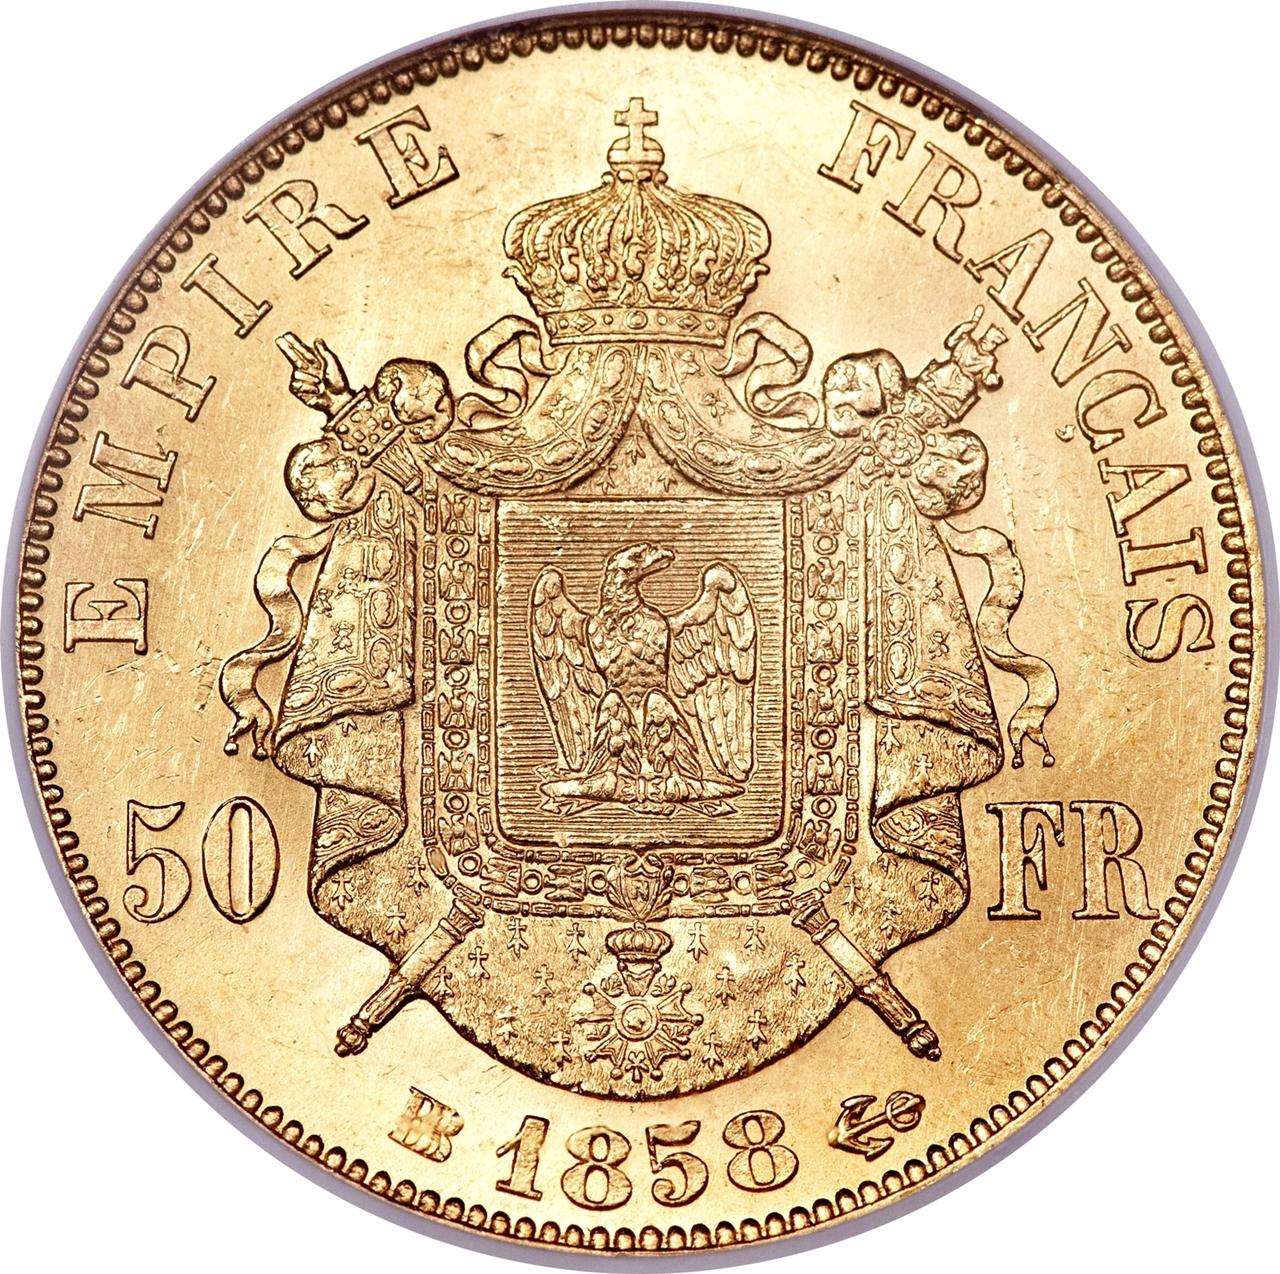 50 Francs Napoleon Iii France Numista